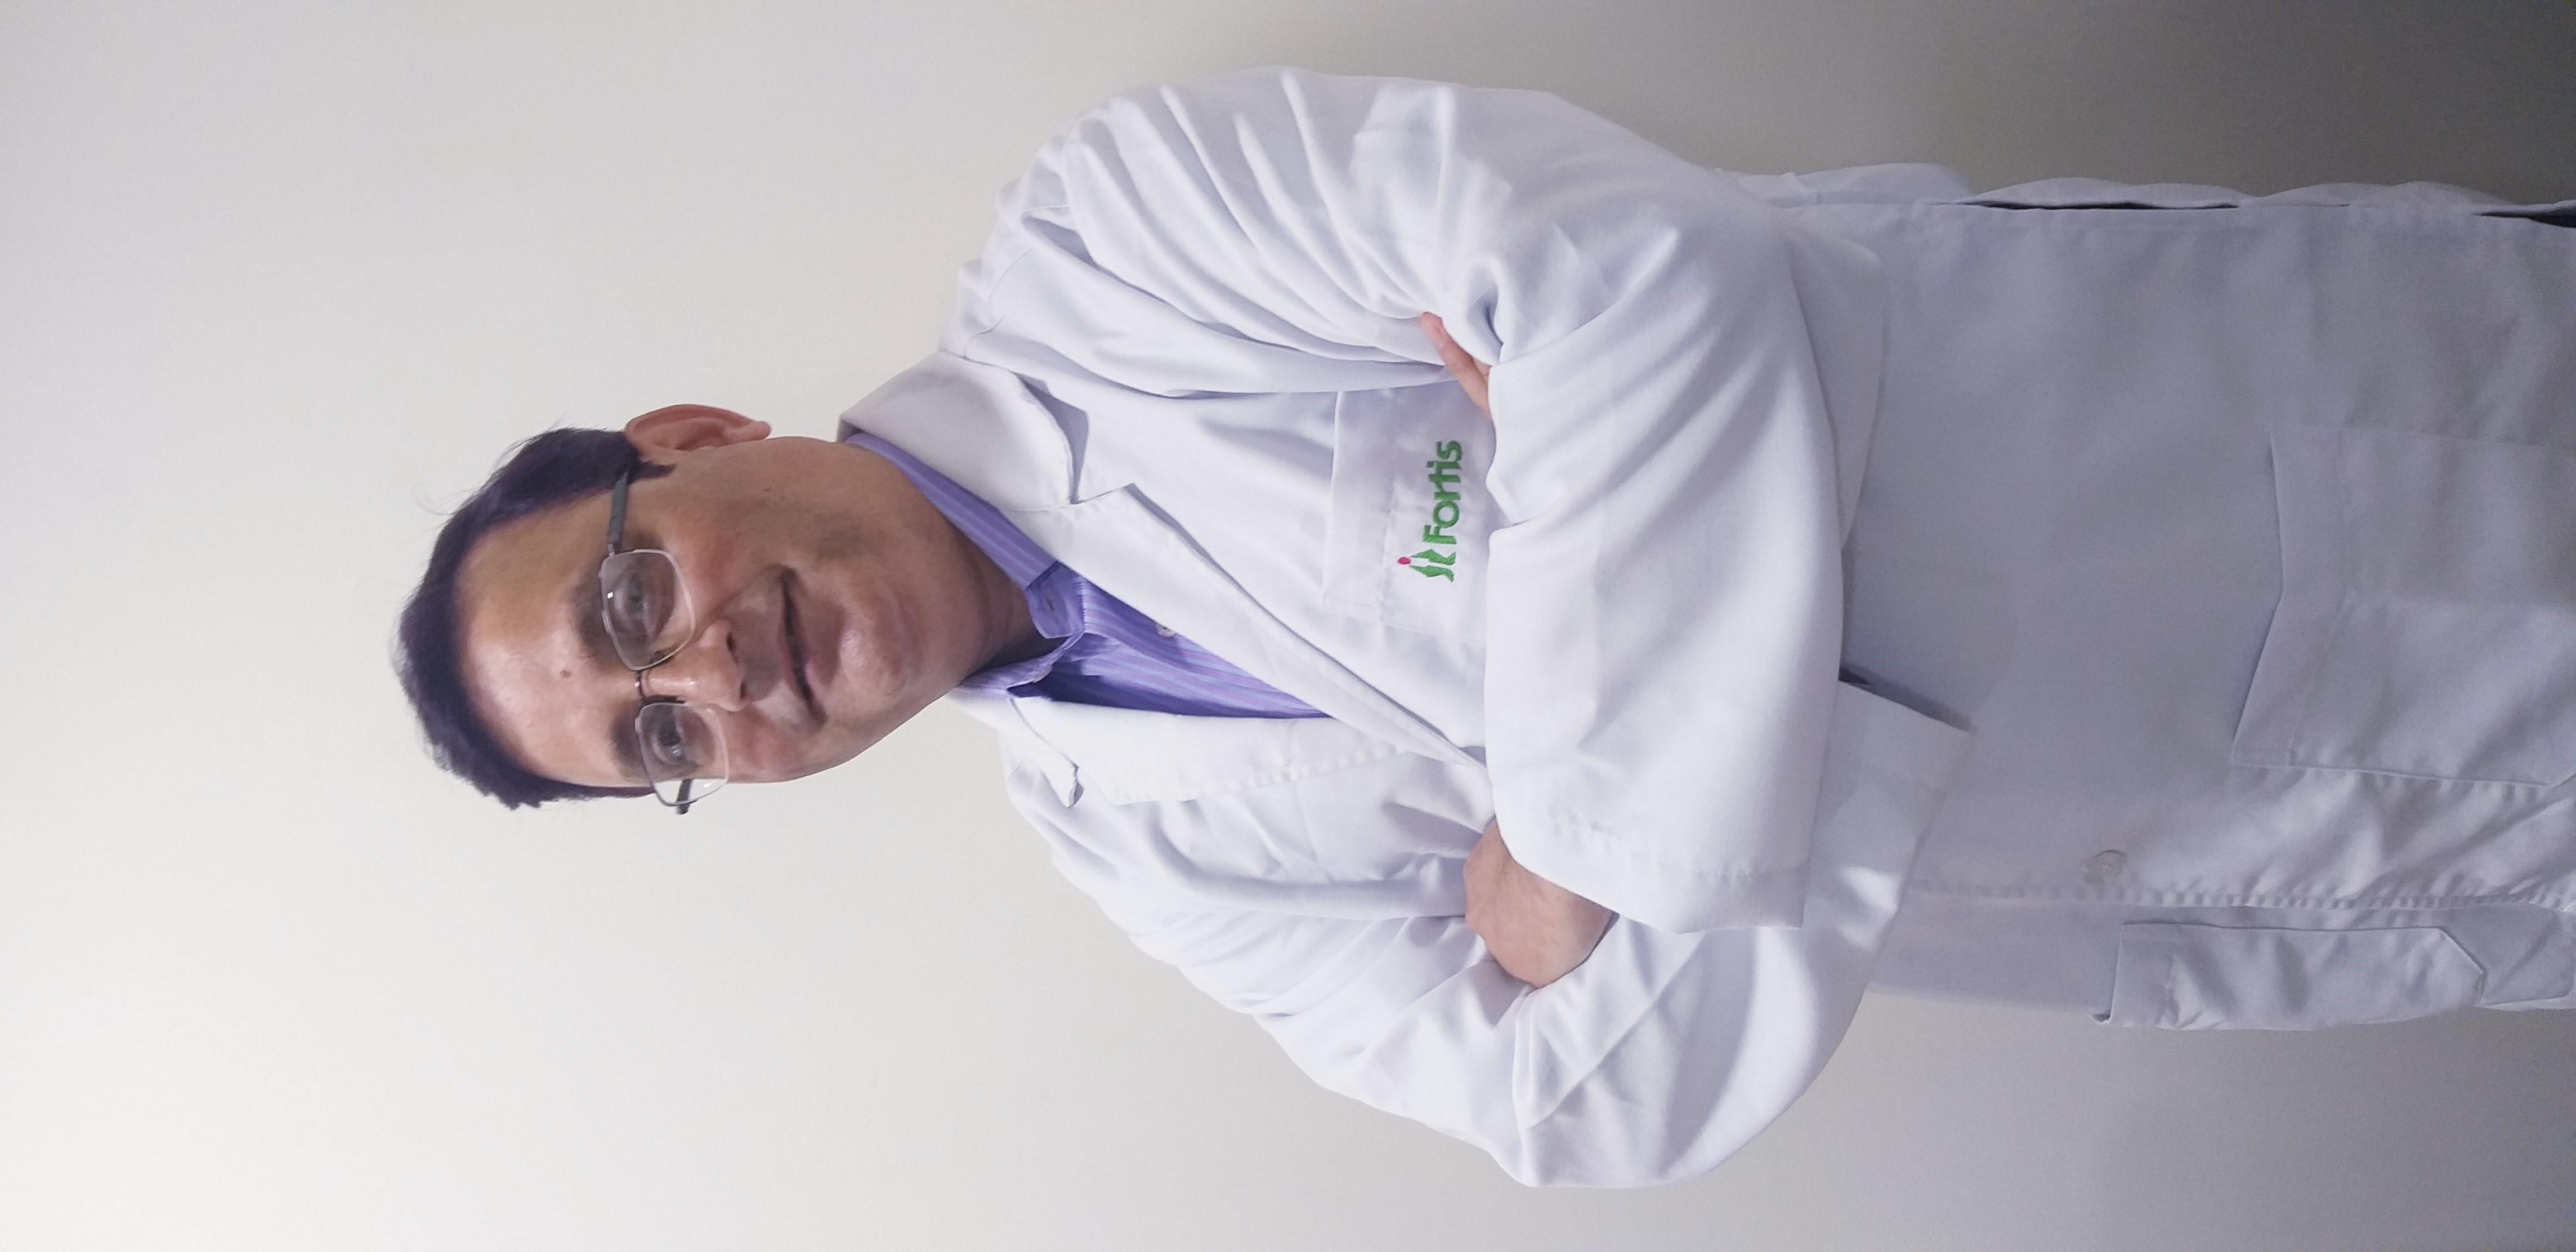 Dr. Himangshu Nagar